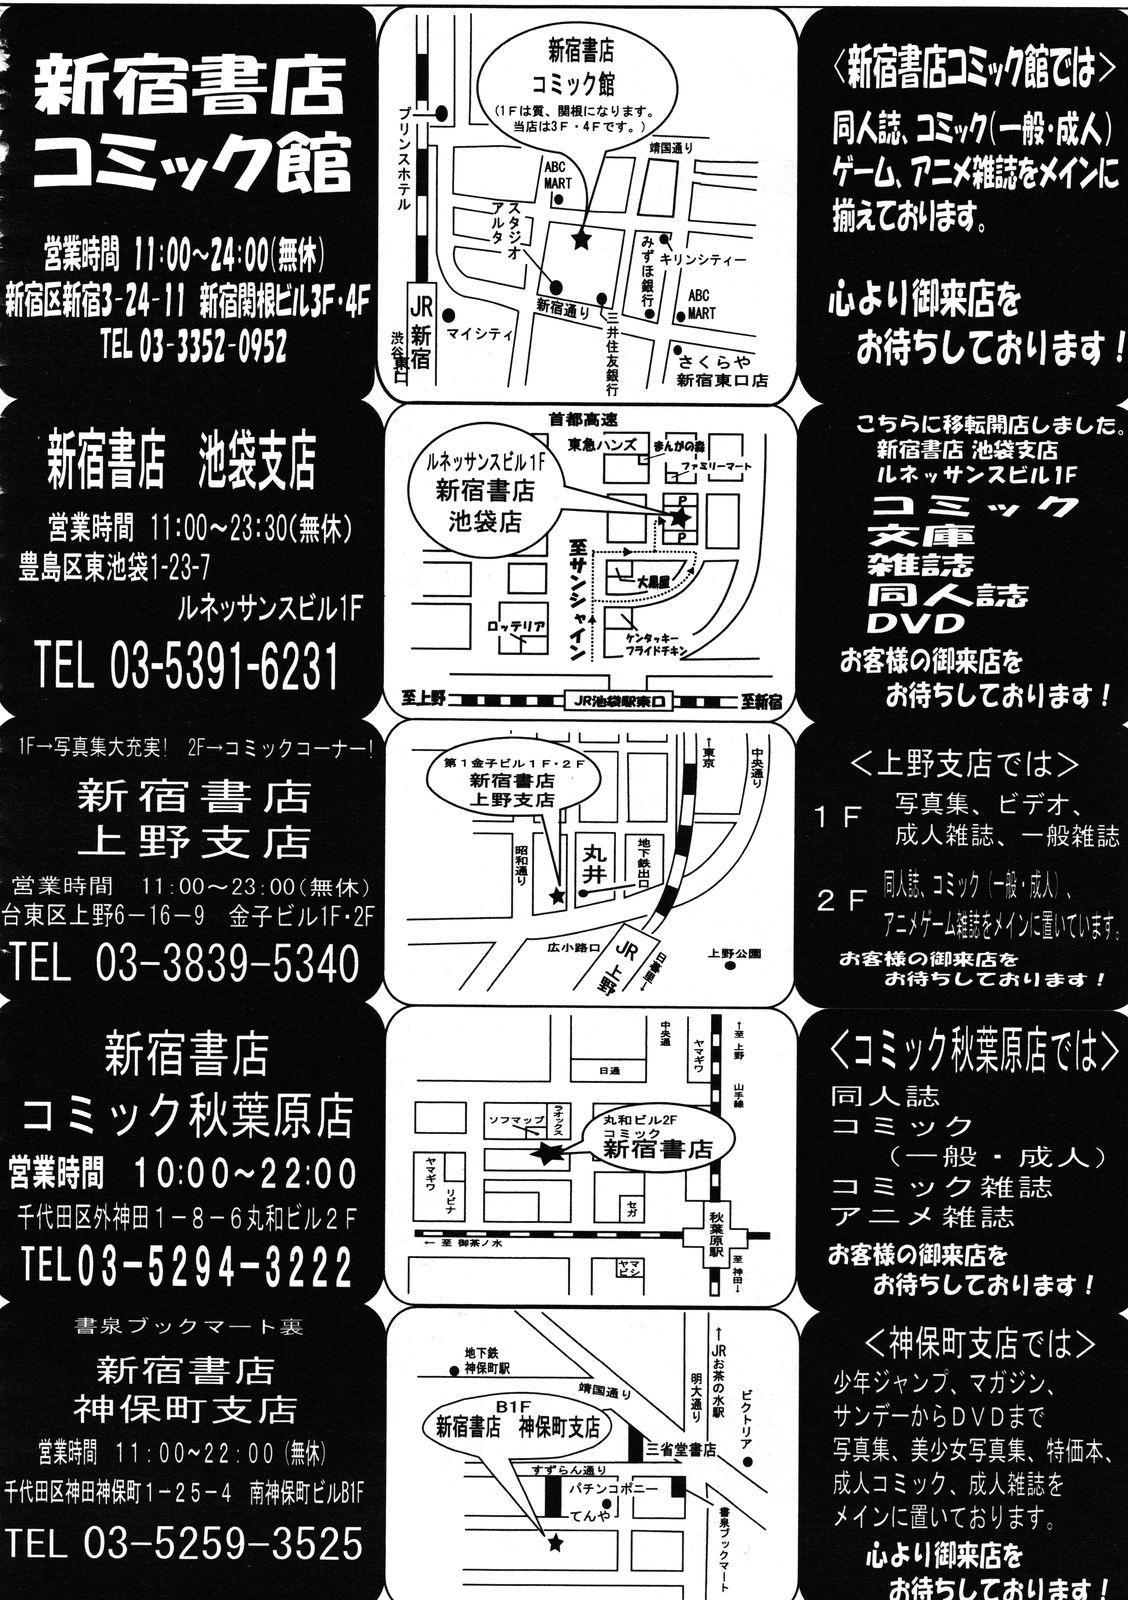 COMIC Megastore 2012-01 401